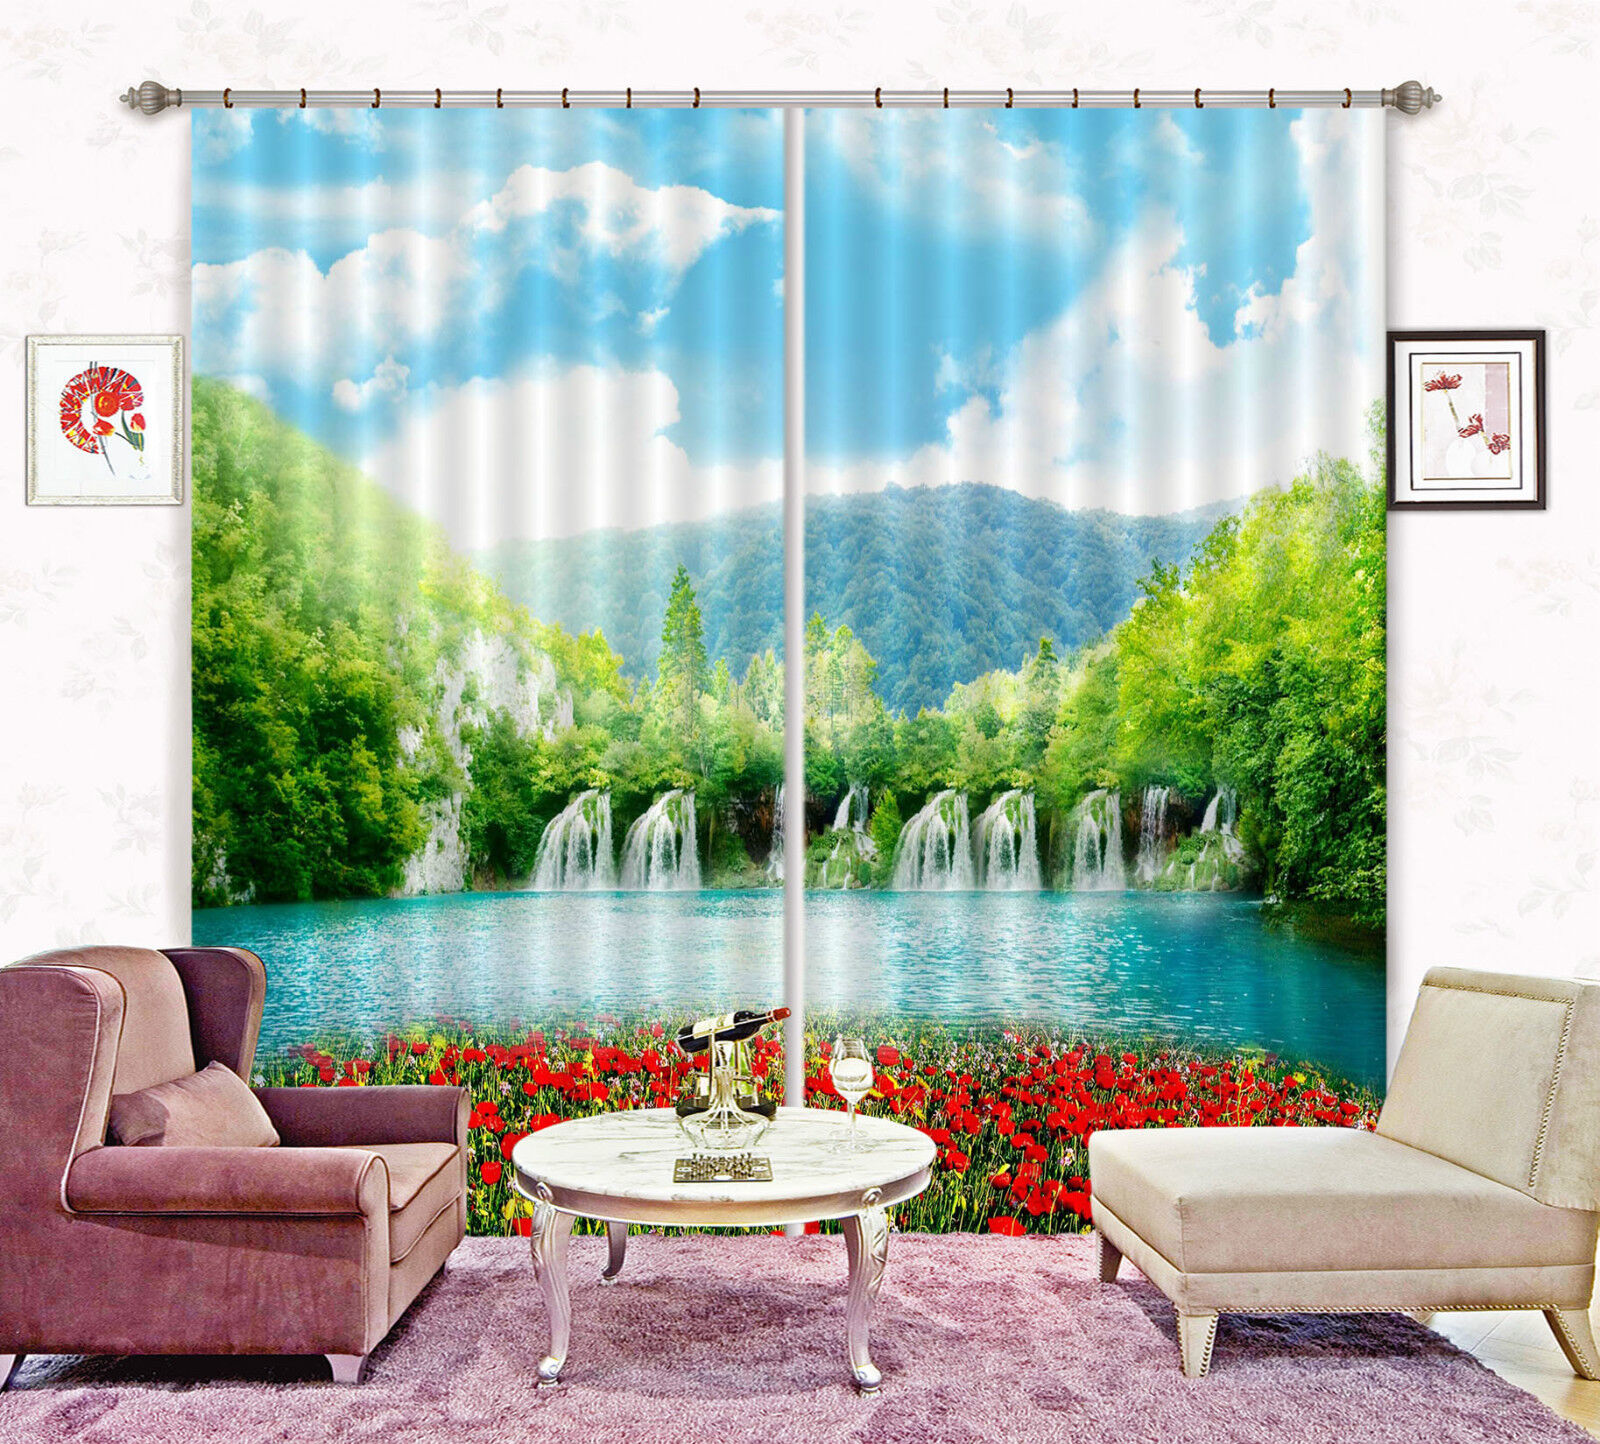 3d paisaje 5466 bloqueo foto cortina cortina de impresión sustancia cortinas de ventana